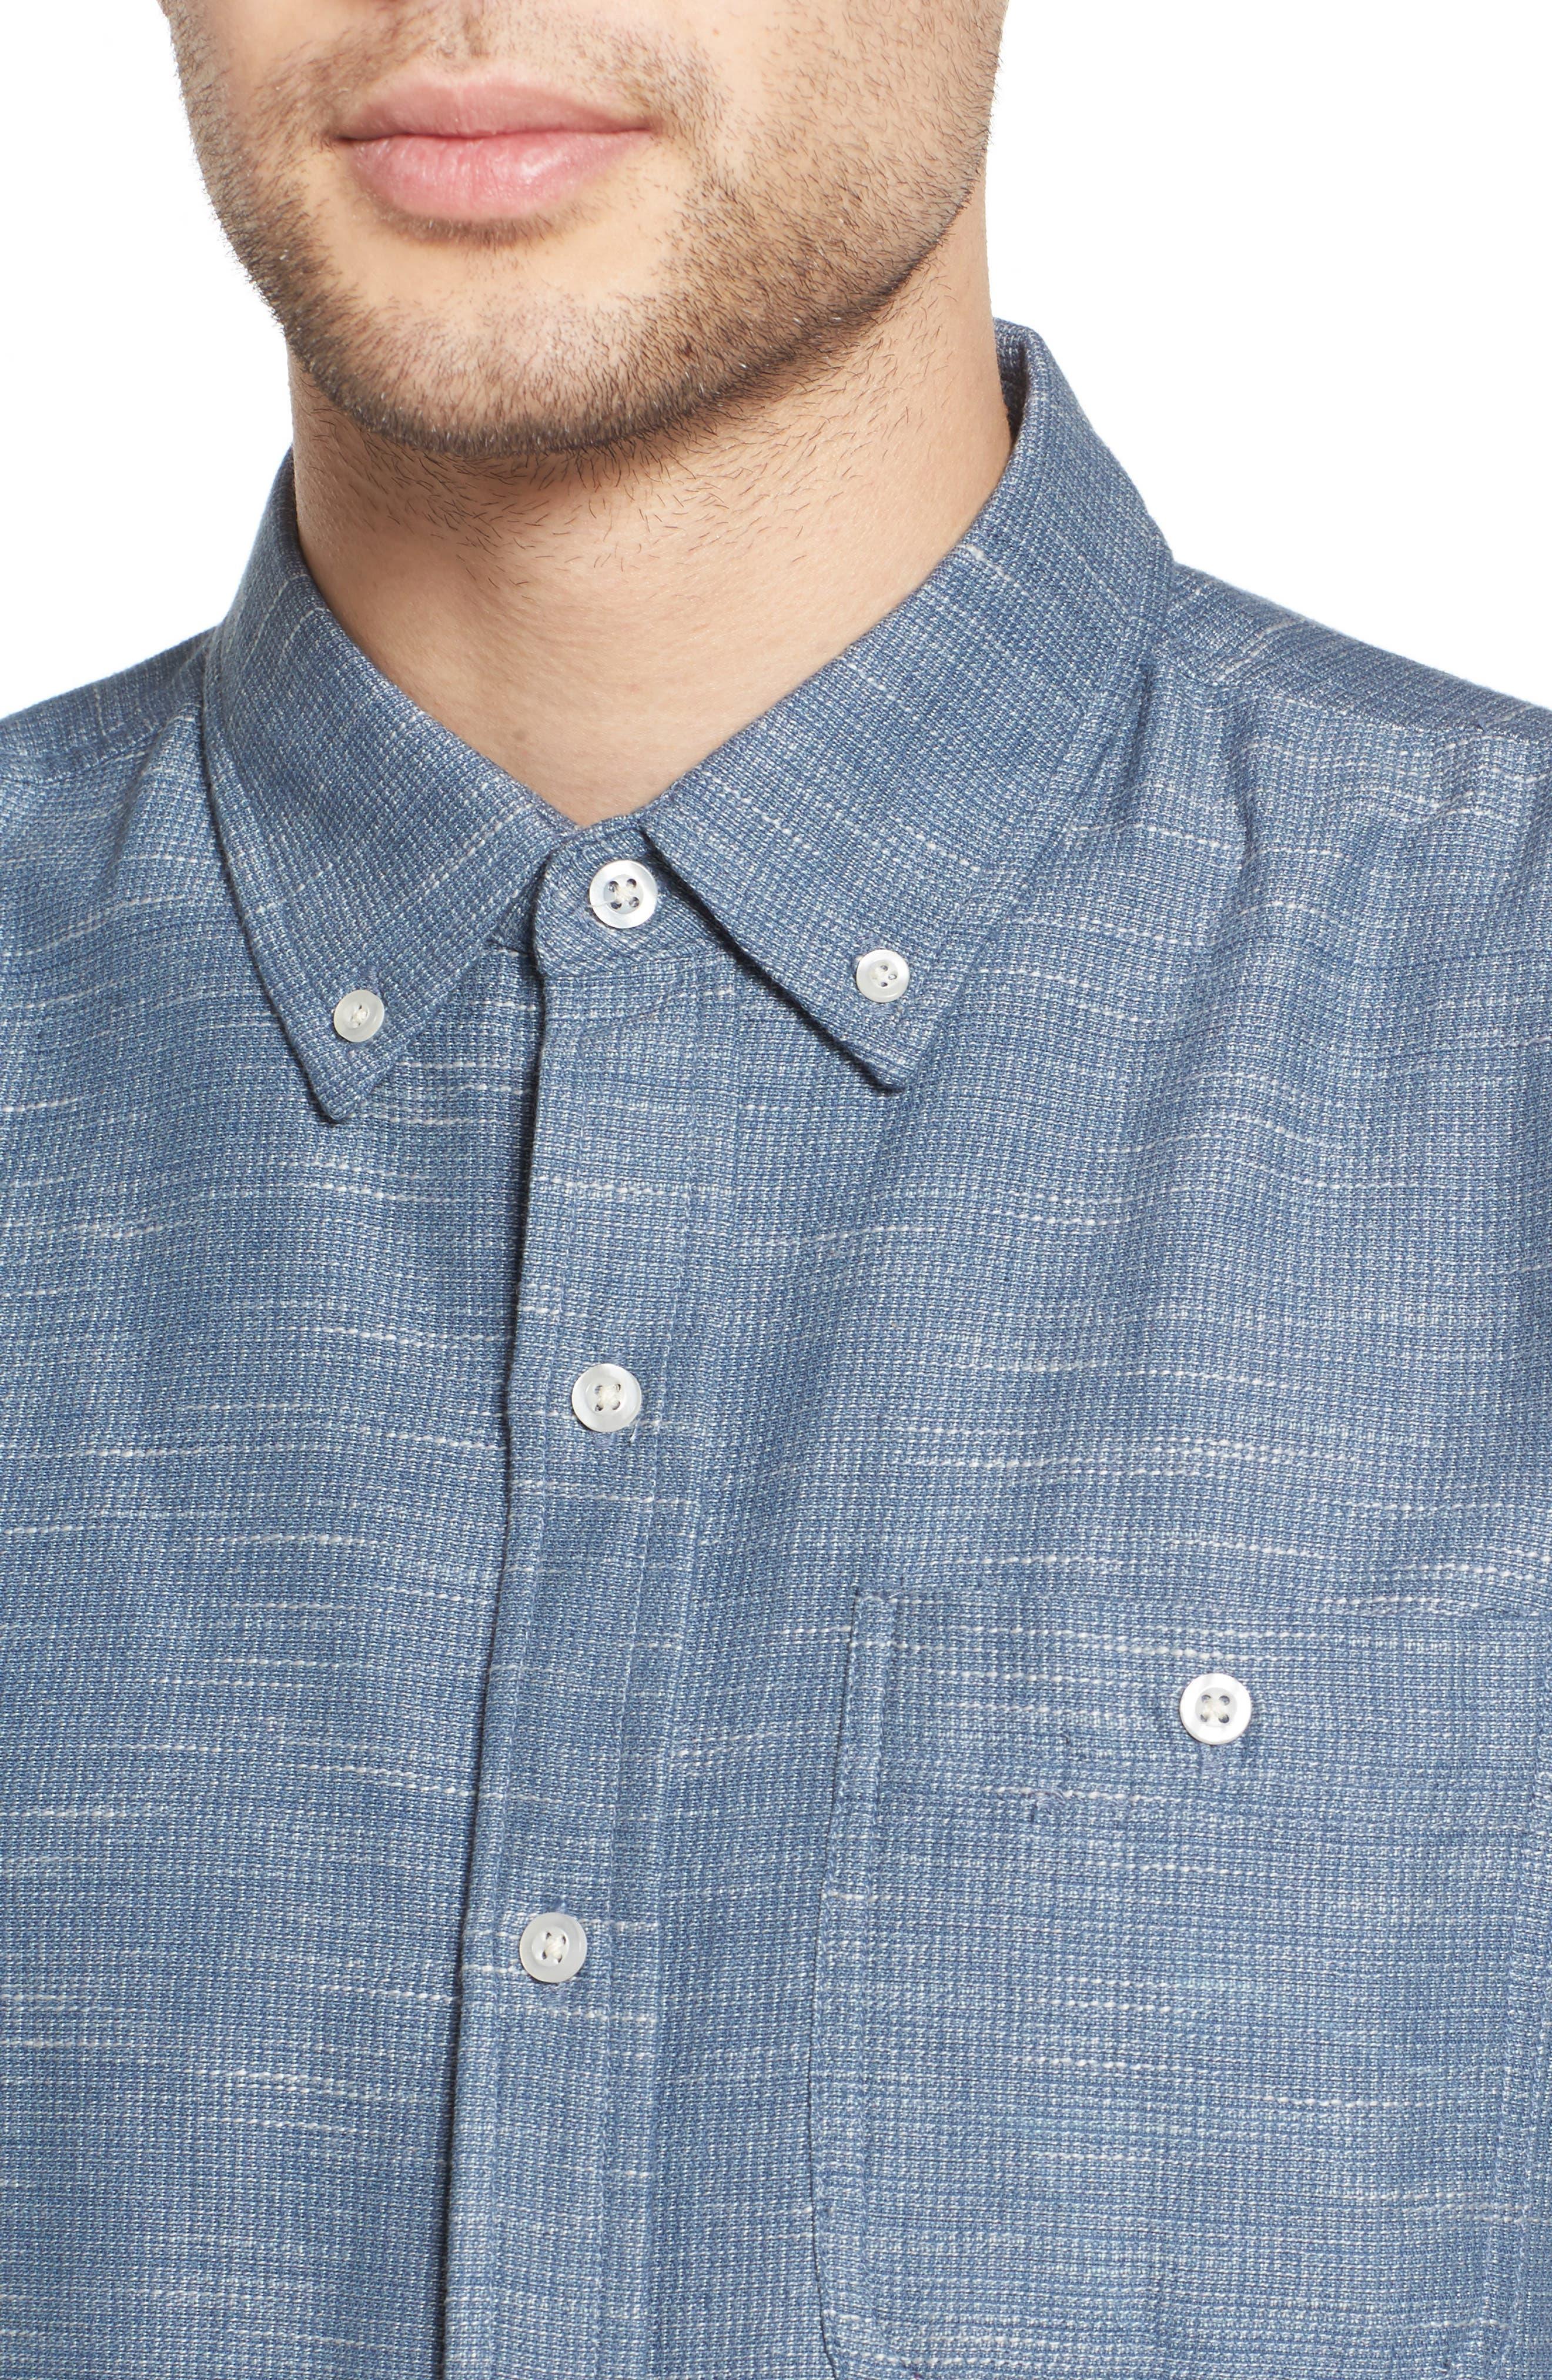 Textured Woven Shirt,                             Alternate thumbnail 4, color,                             476